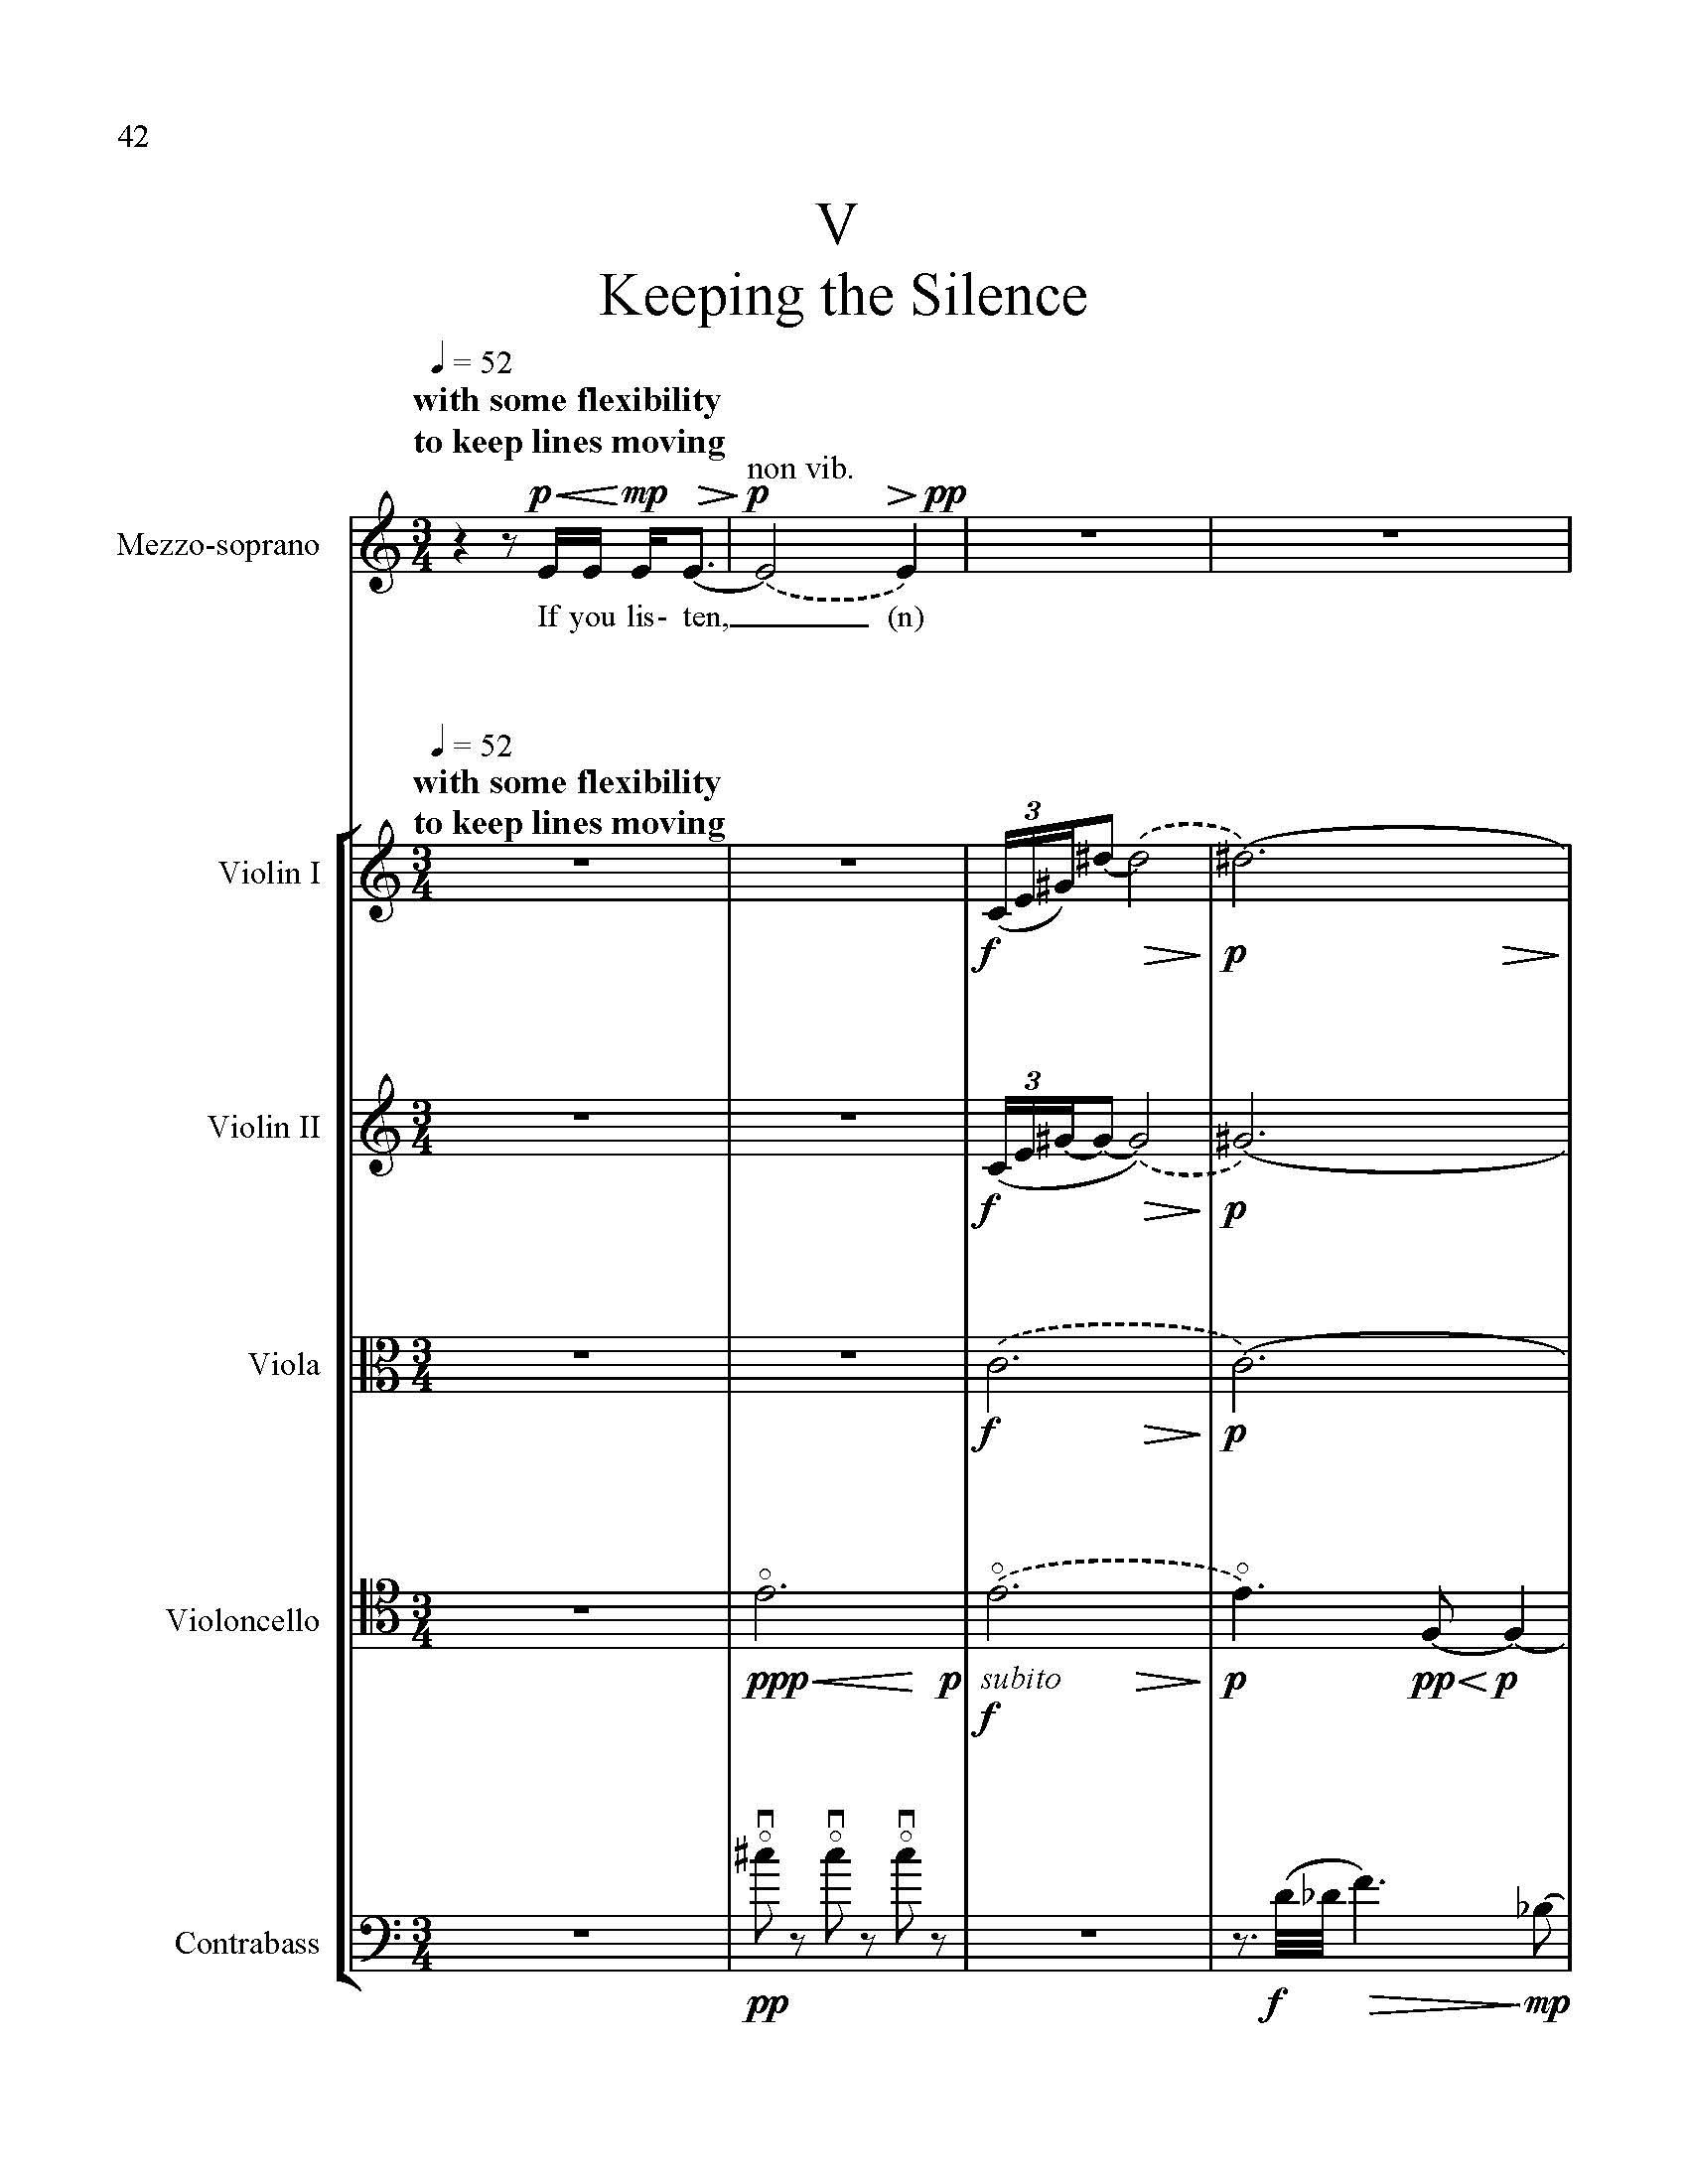 Keeping the Silence